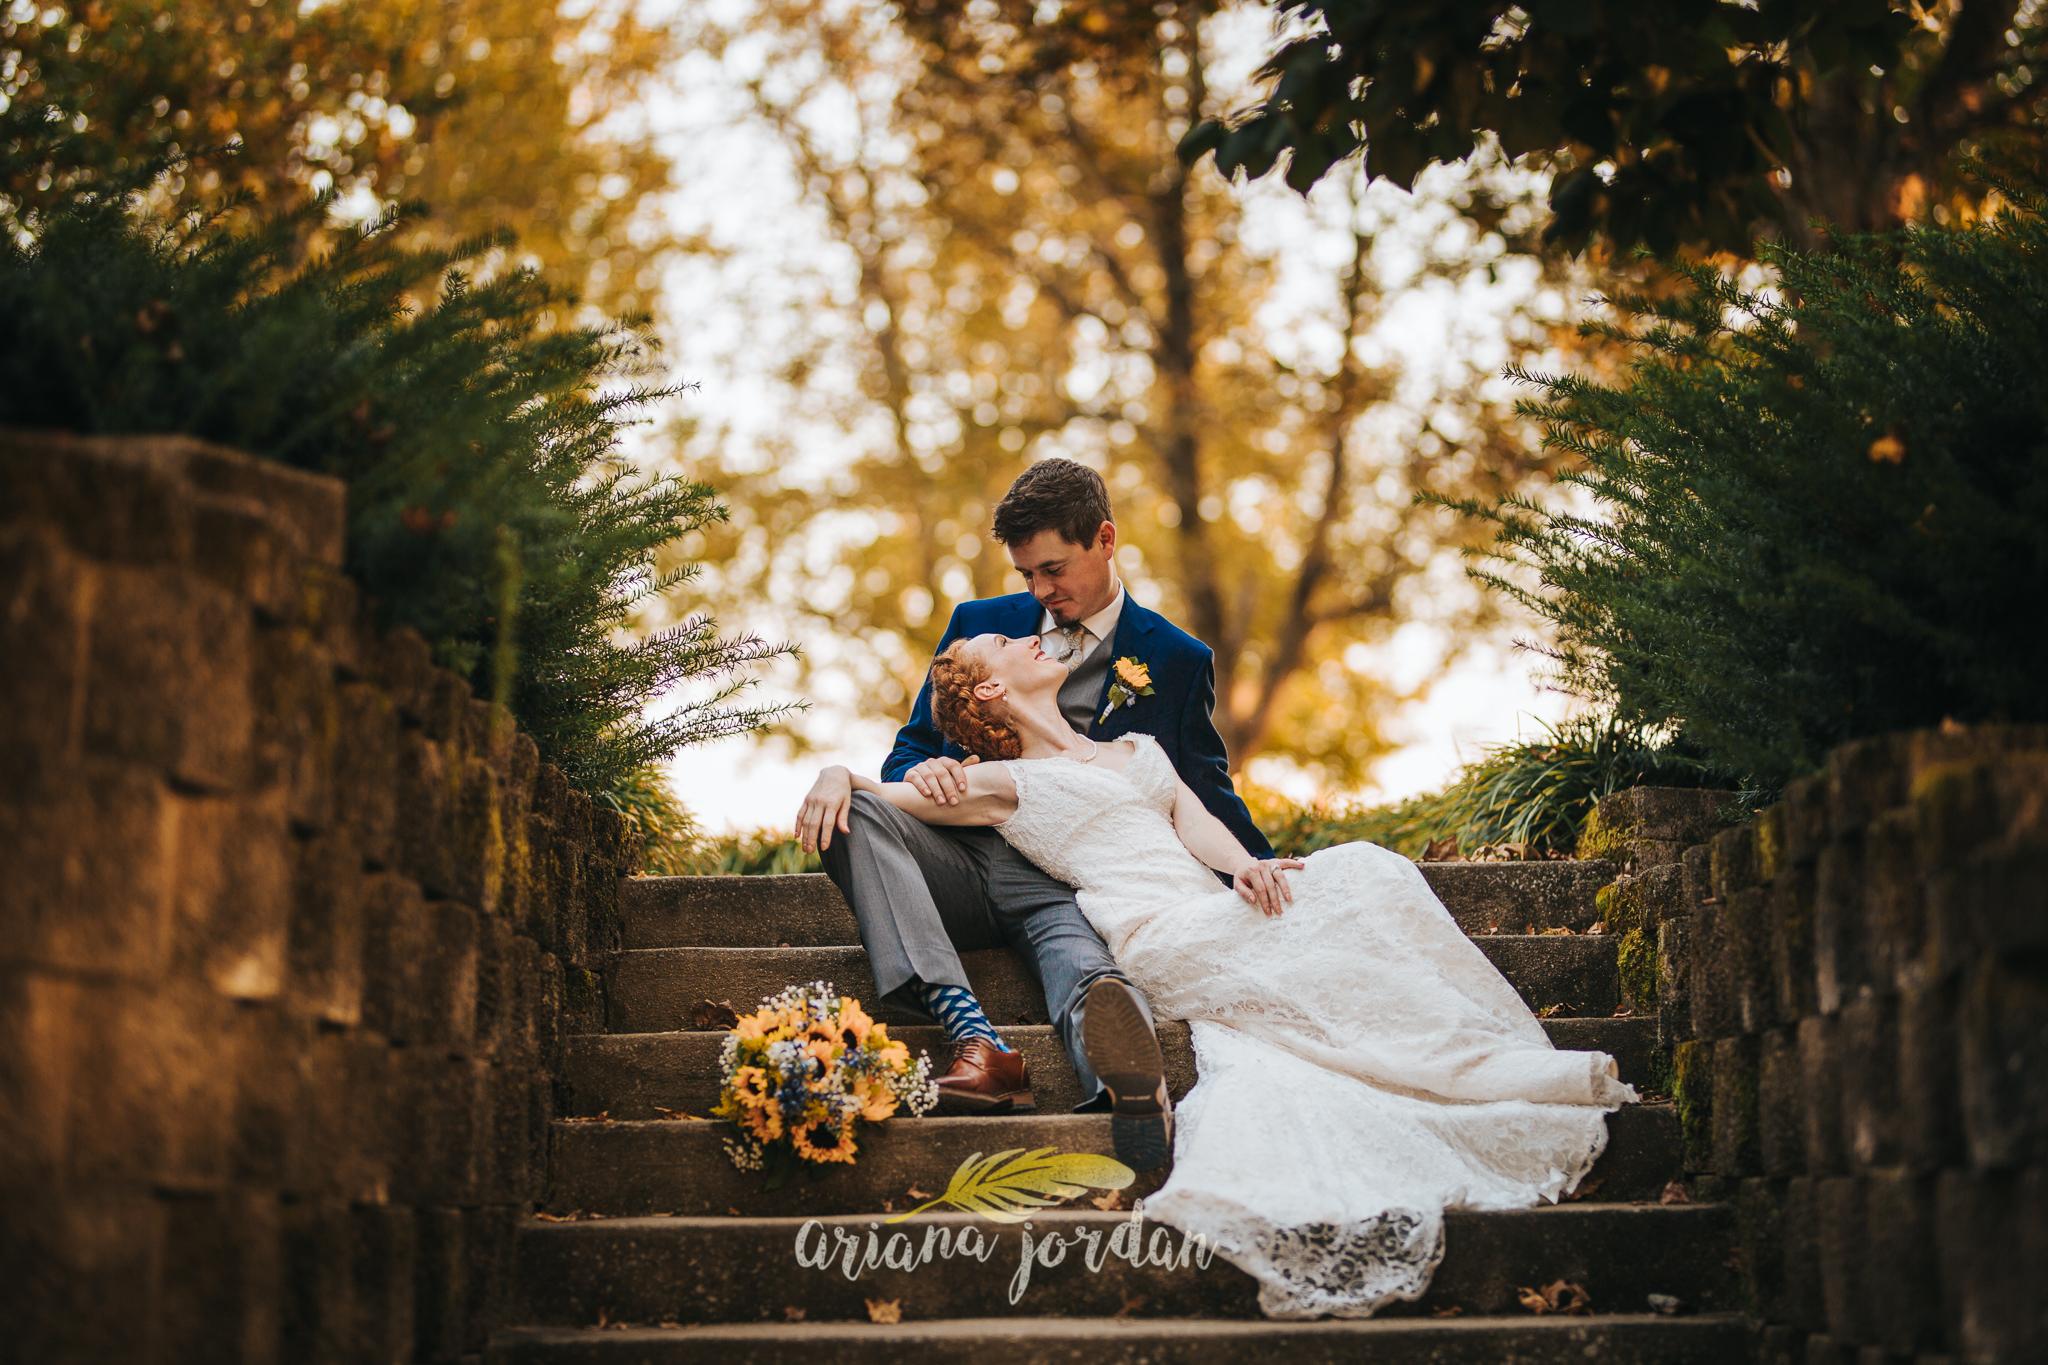 123 Ariana Jordan Photography -Moonlight Fields Lexington Ky Wedding Photographer 5061.jpg